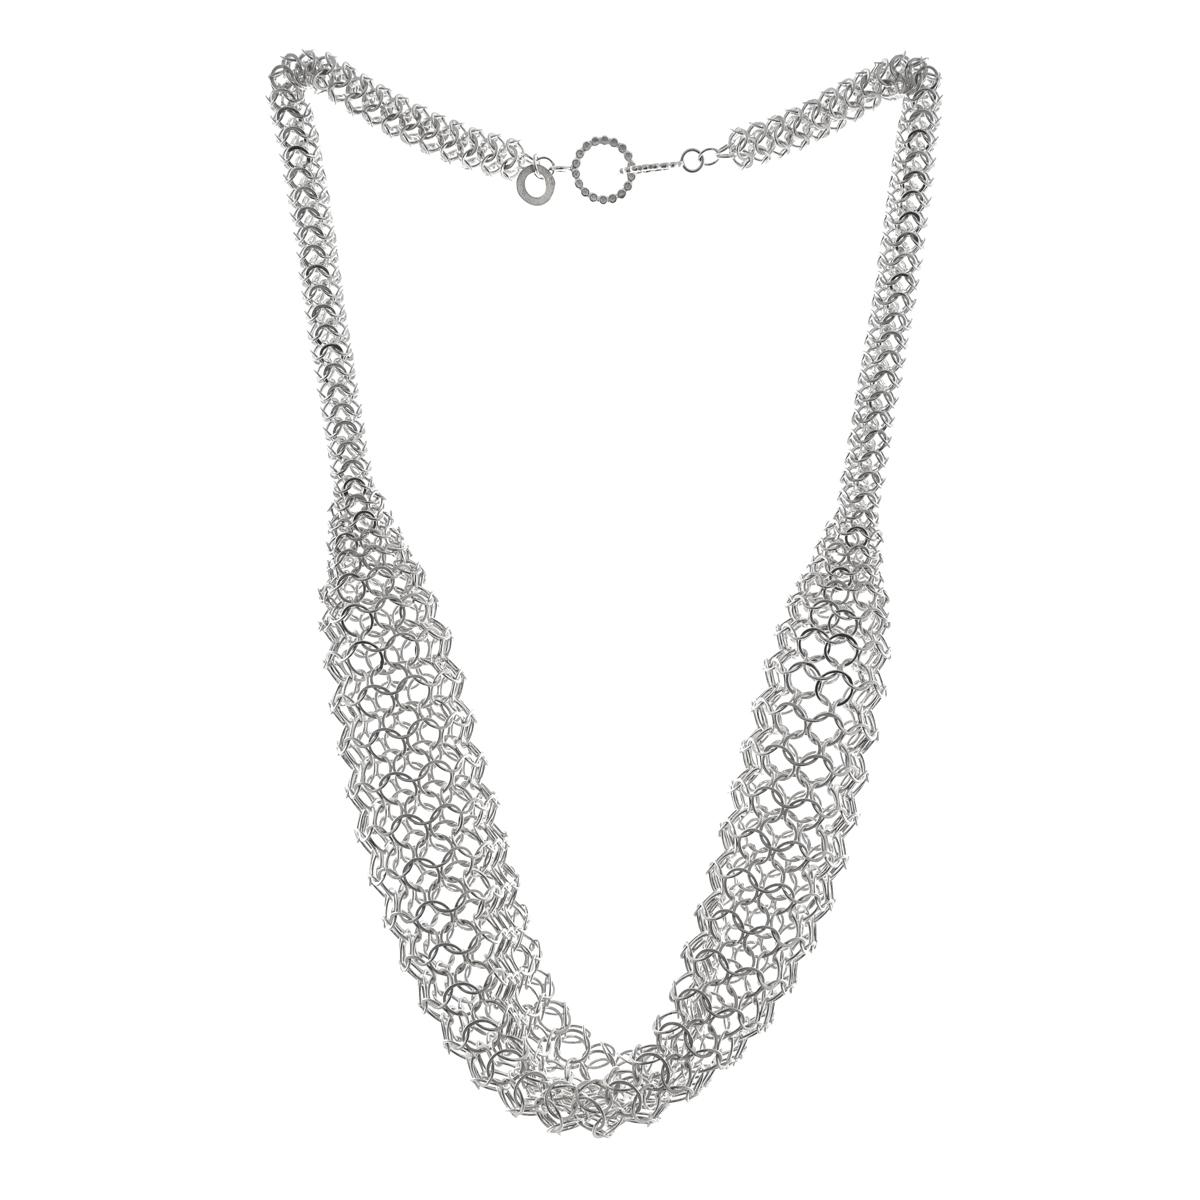 Leys necklace, silver